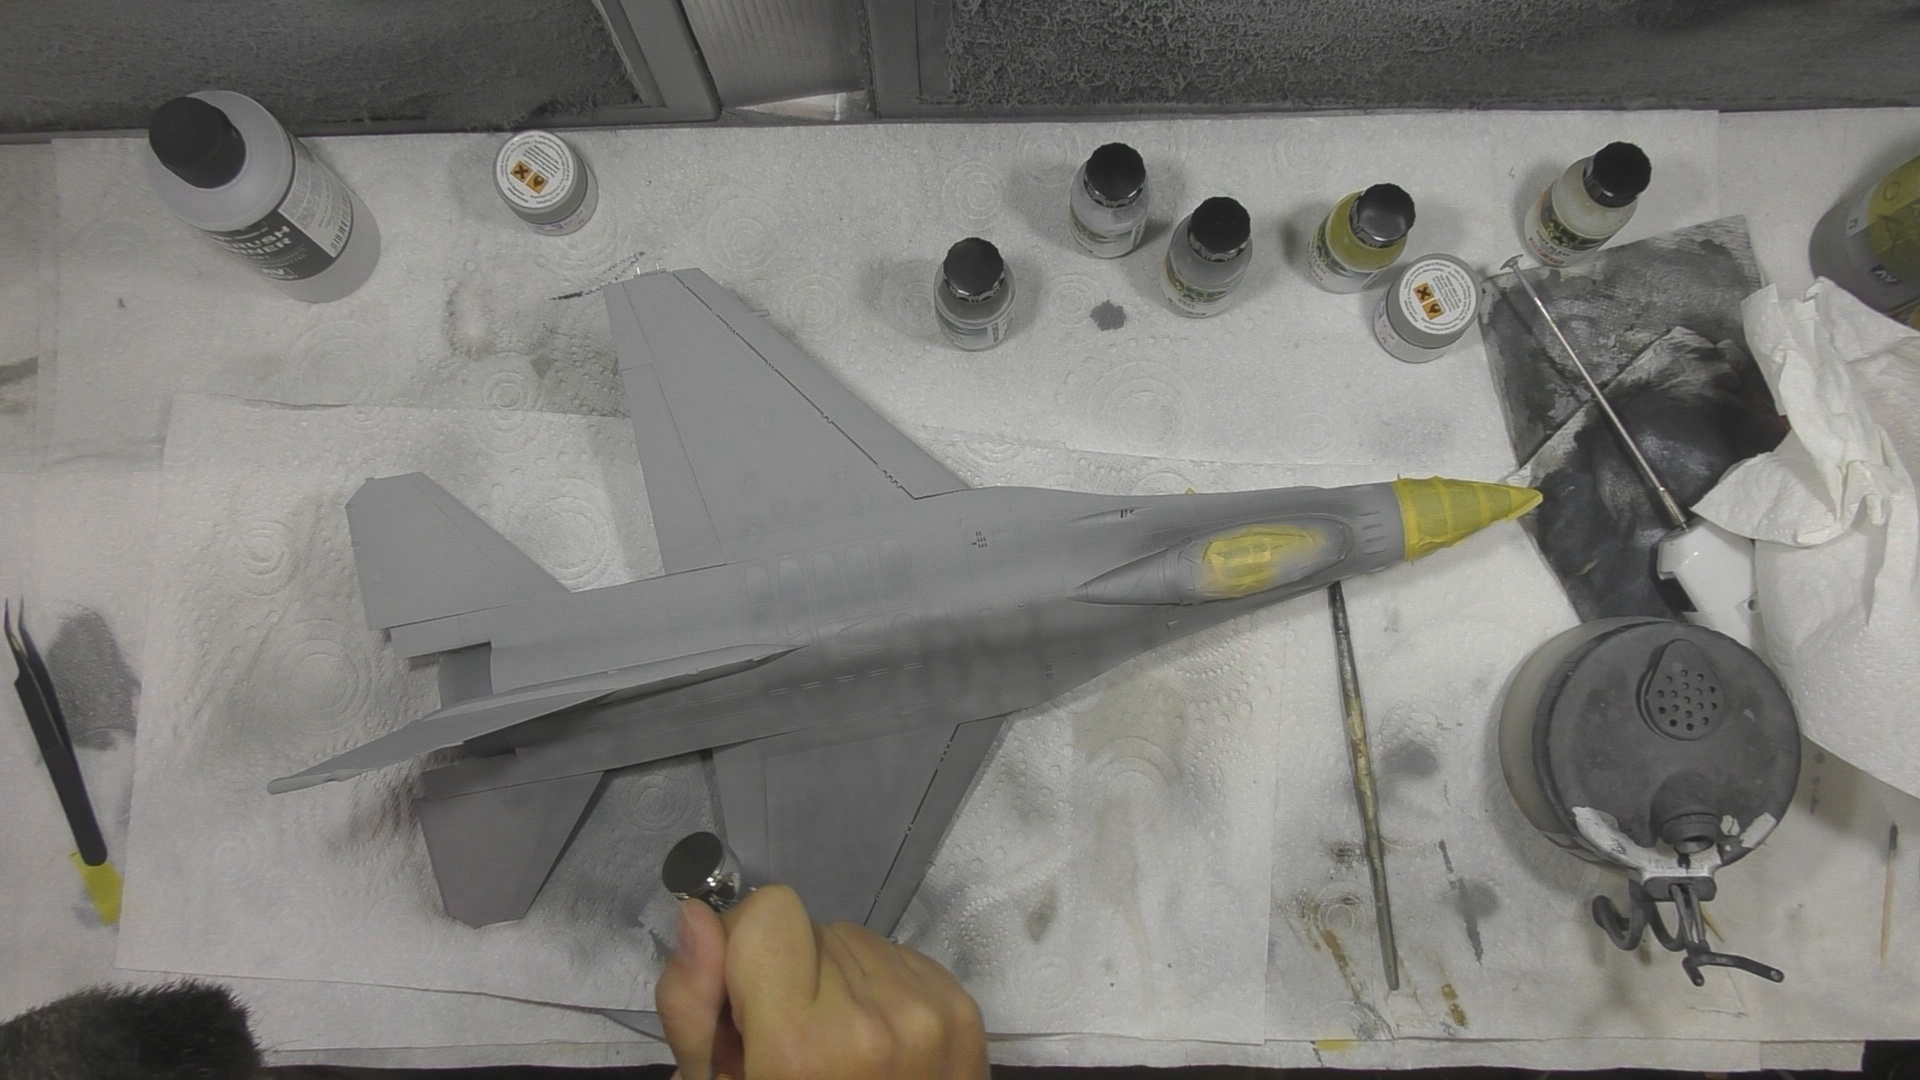 Tamiya F16 Part 9 Pic 2.jpg